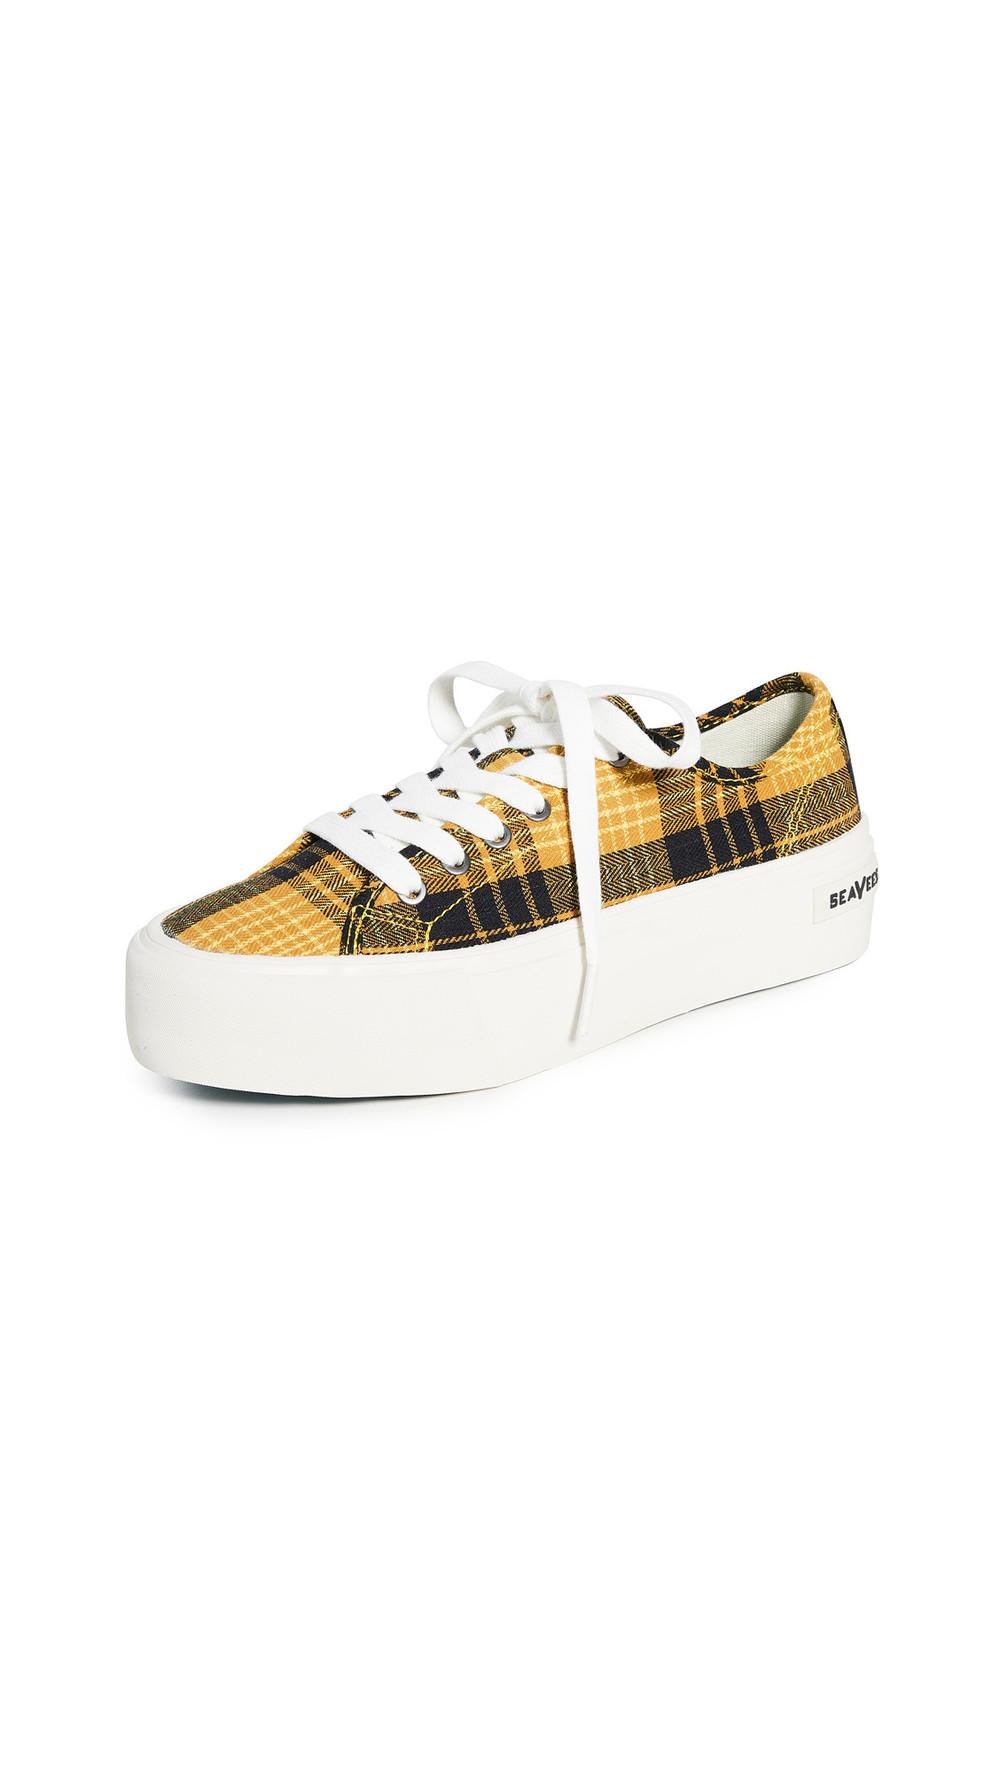 SeaVees Monterey Platform Sun Valley Sneakers in yellow